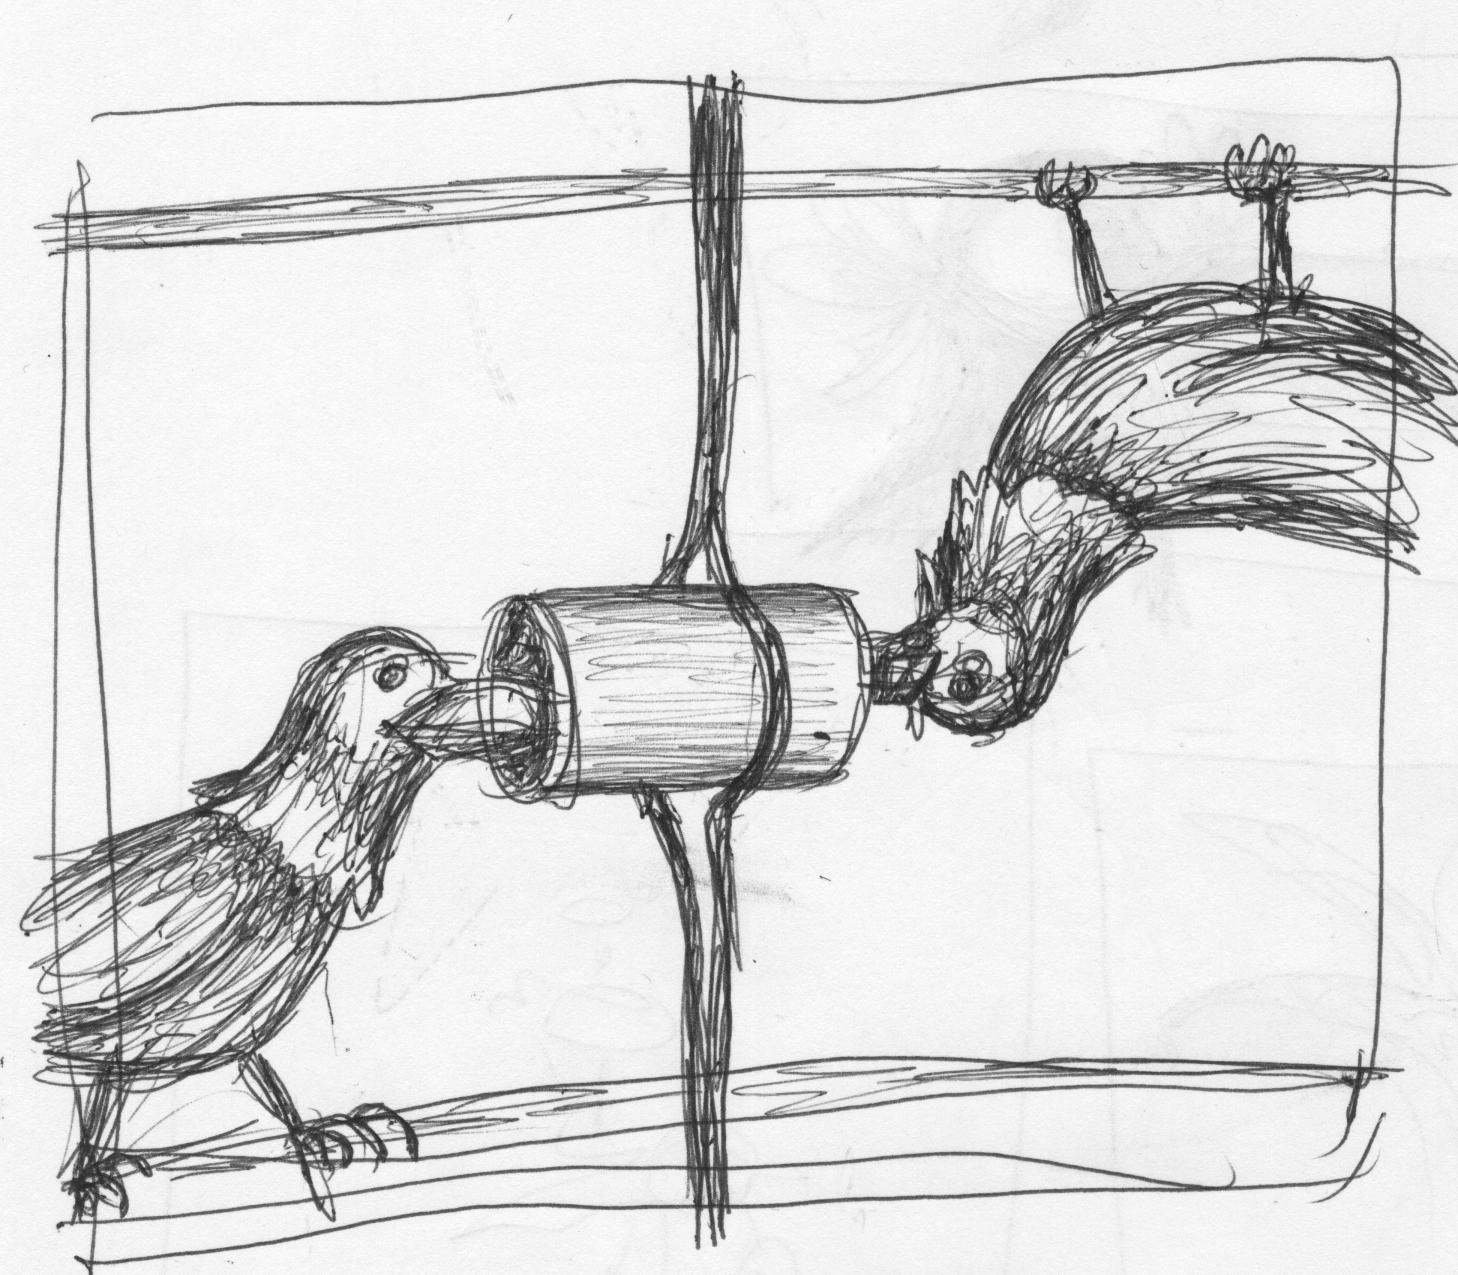 Communicating crows deftly defy gravity.